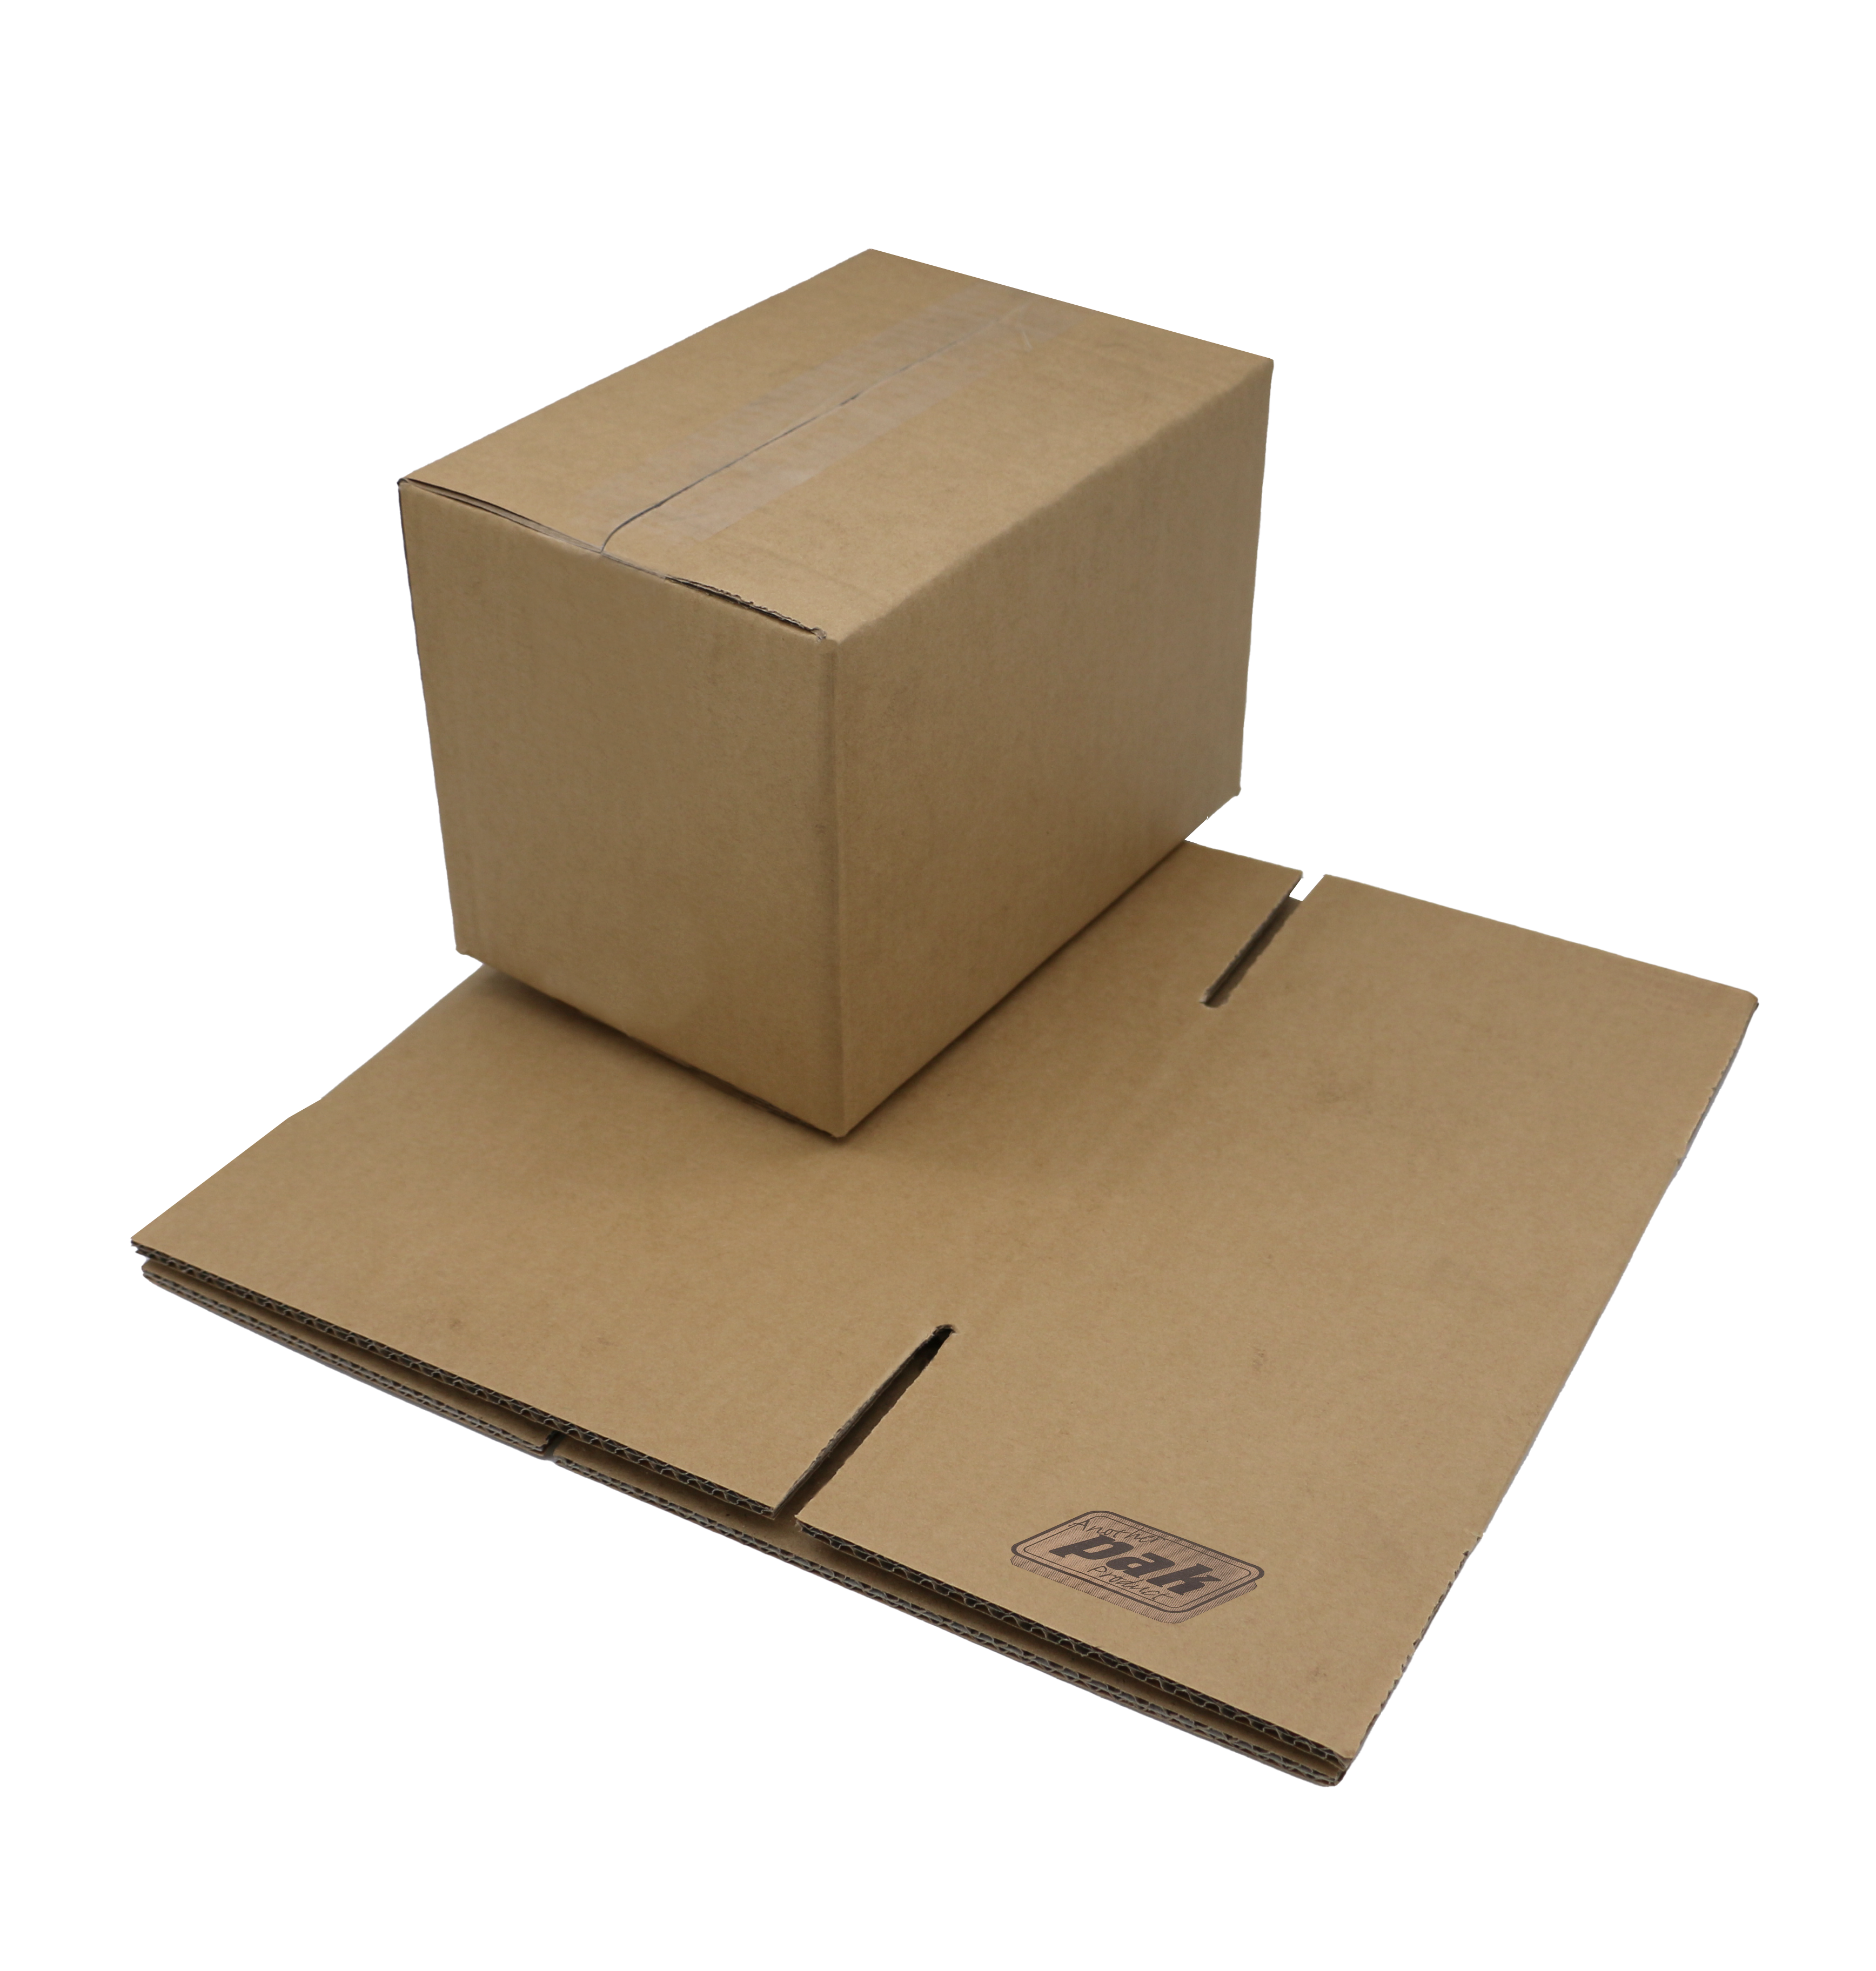 800 x 290 x 800mm Double Wall Carton